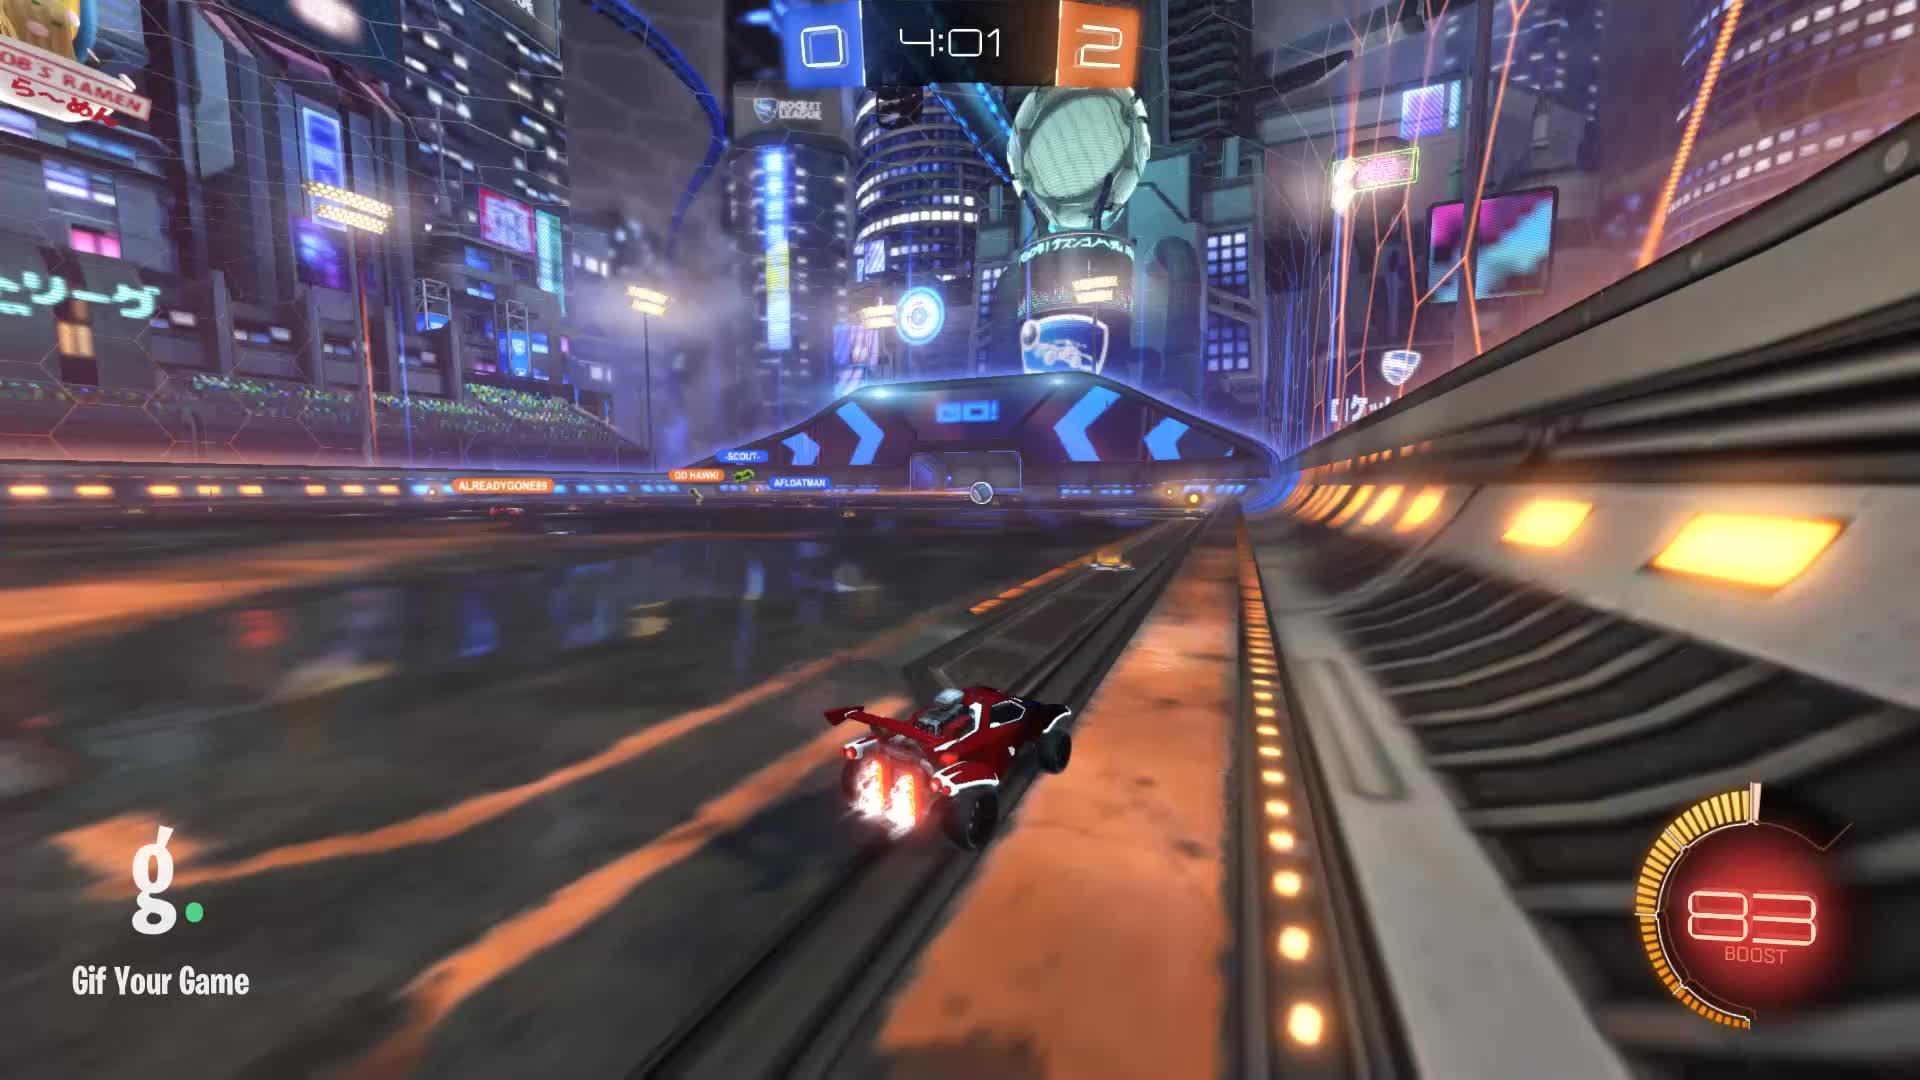 AMD, Gif Your Game, GifYourGame, Goal, Rocket League, RocketLeague, Goal 3: AMD GIFs